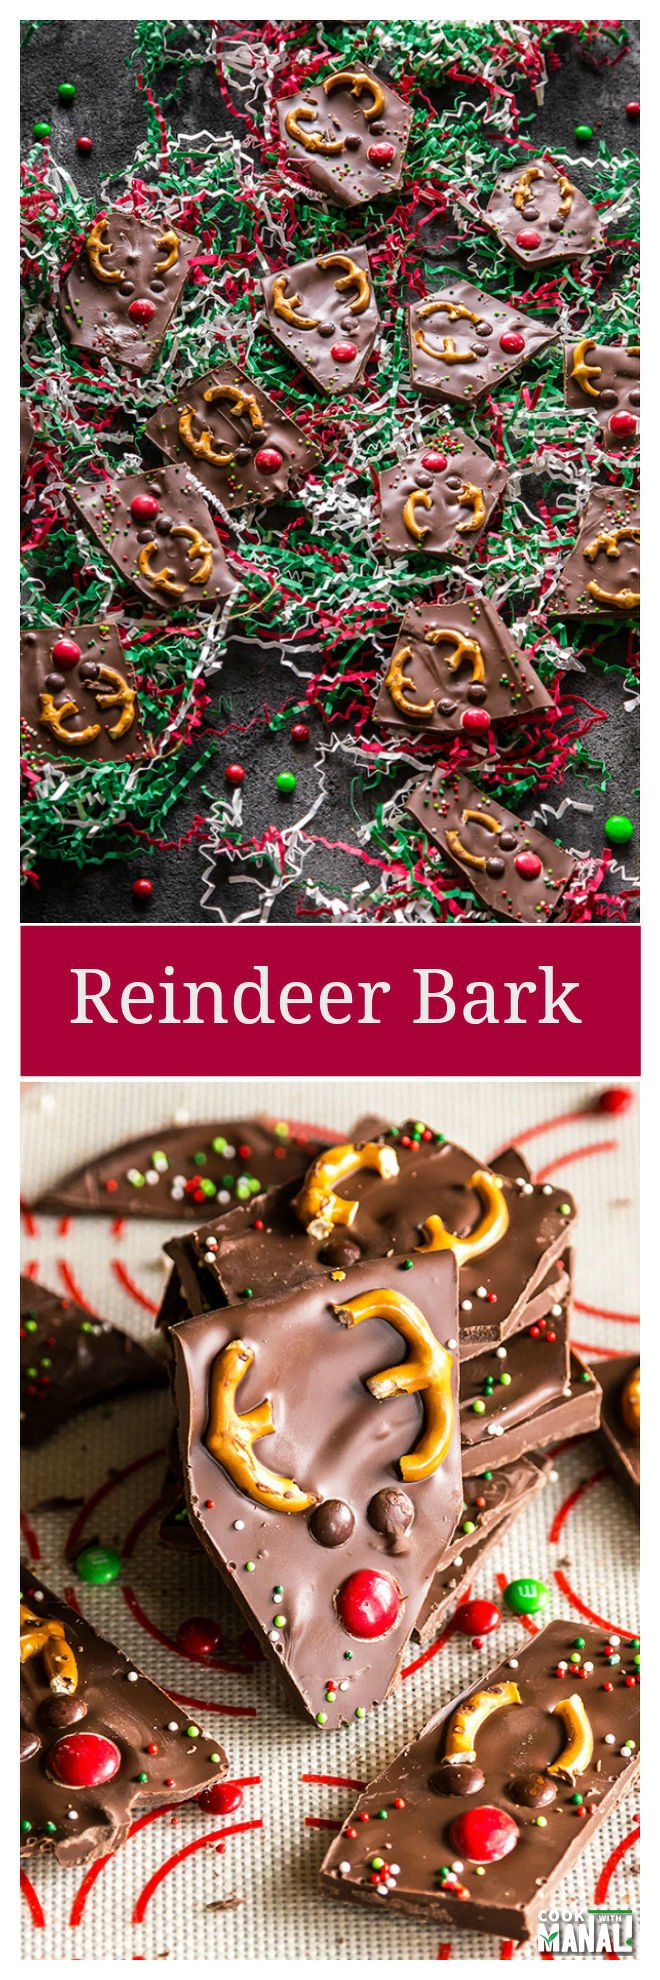 reindeer-bark-collage